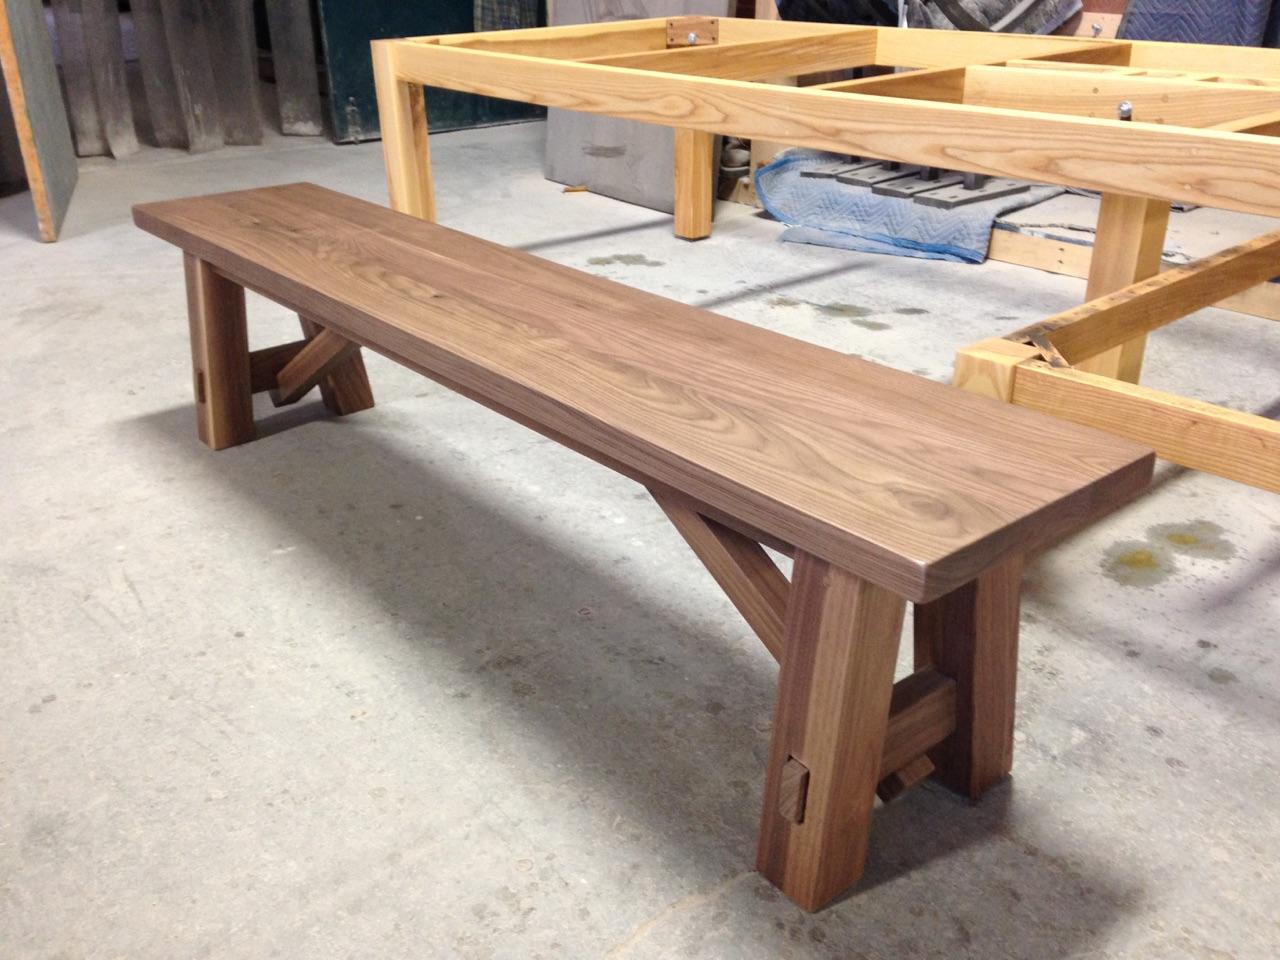 Solid Walnut Bench with a Custom Trestle Design.